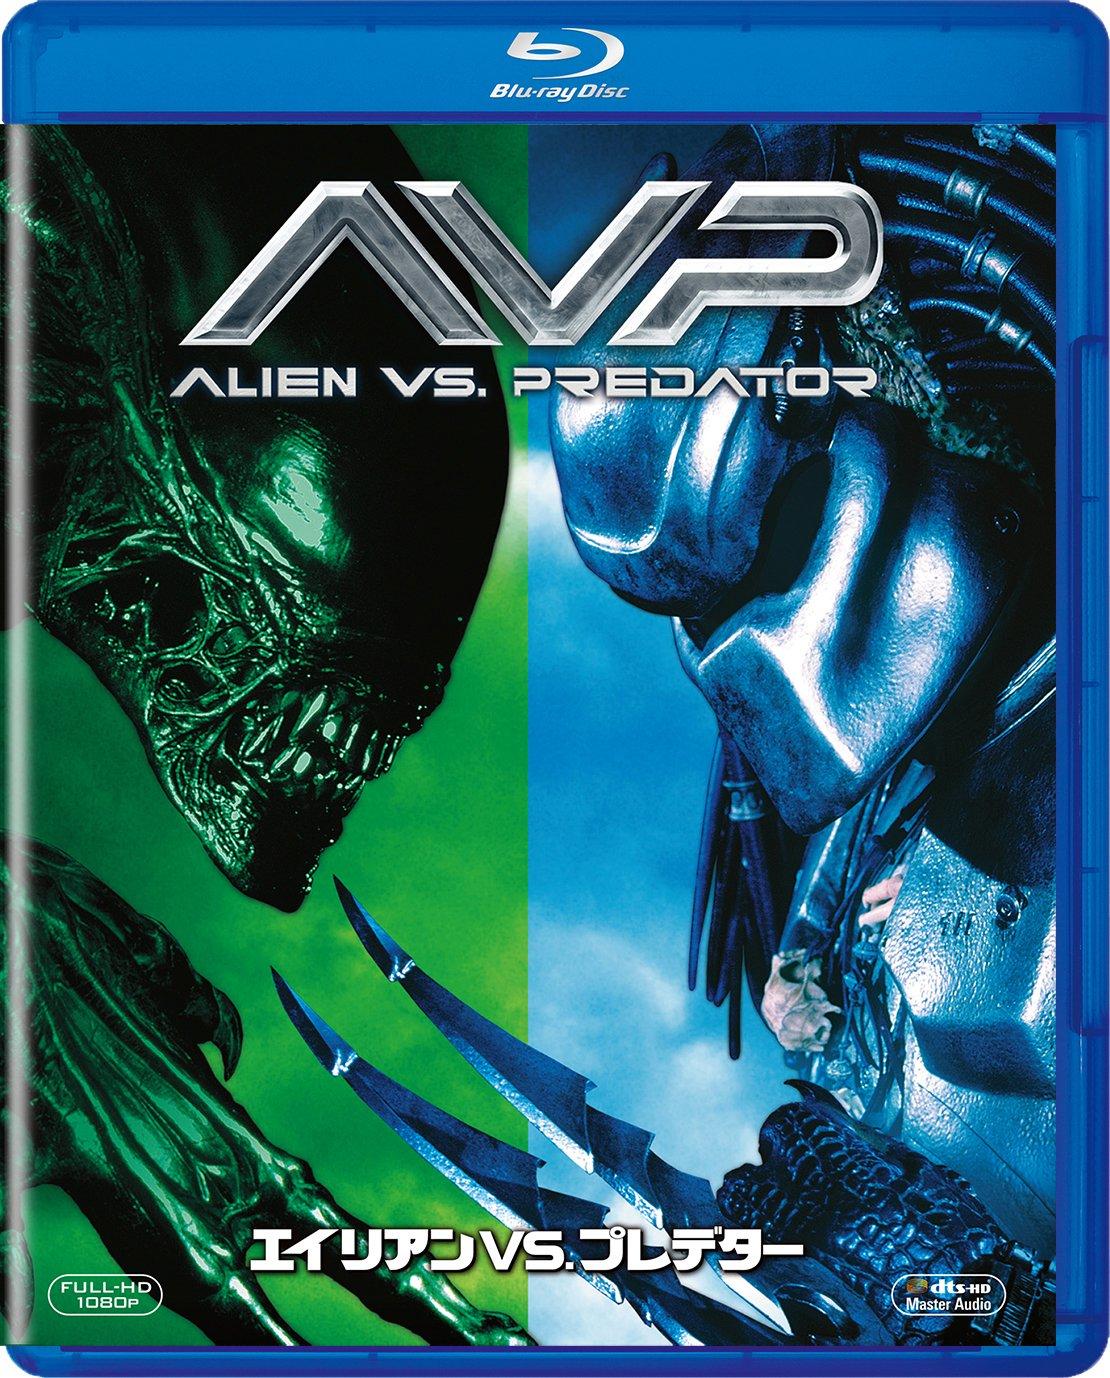 Free Download Alien vs. Predator (2004) Hollywood Movie ORG Dual Audio [Hindi or English] 720p BluRay 600MB Download On Mp4moviez Fliz Movies